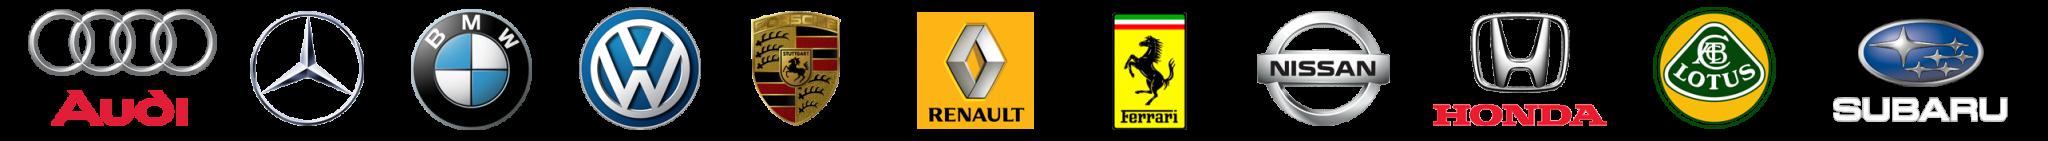 ukauto mandataire angleterre voiture occasion voiture anglaise import auto ukauto - Recherche Import de véhicules d'occasion en provenance d'Angleterre